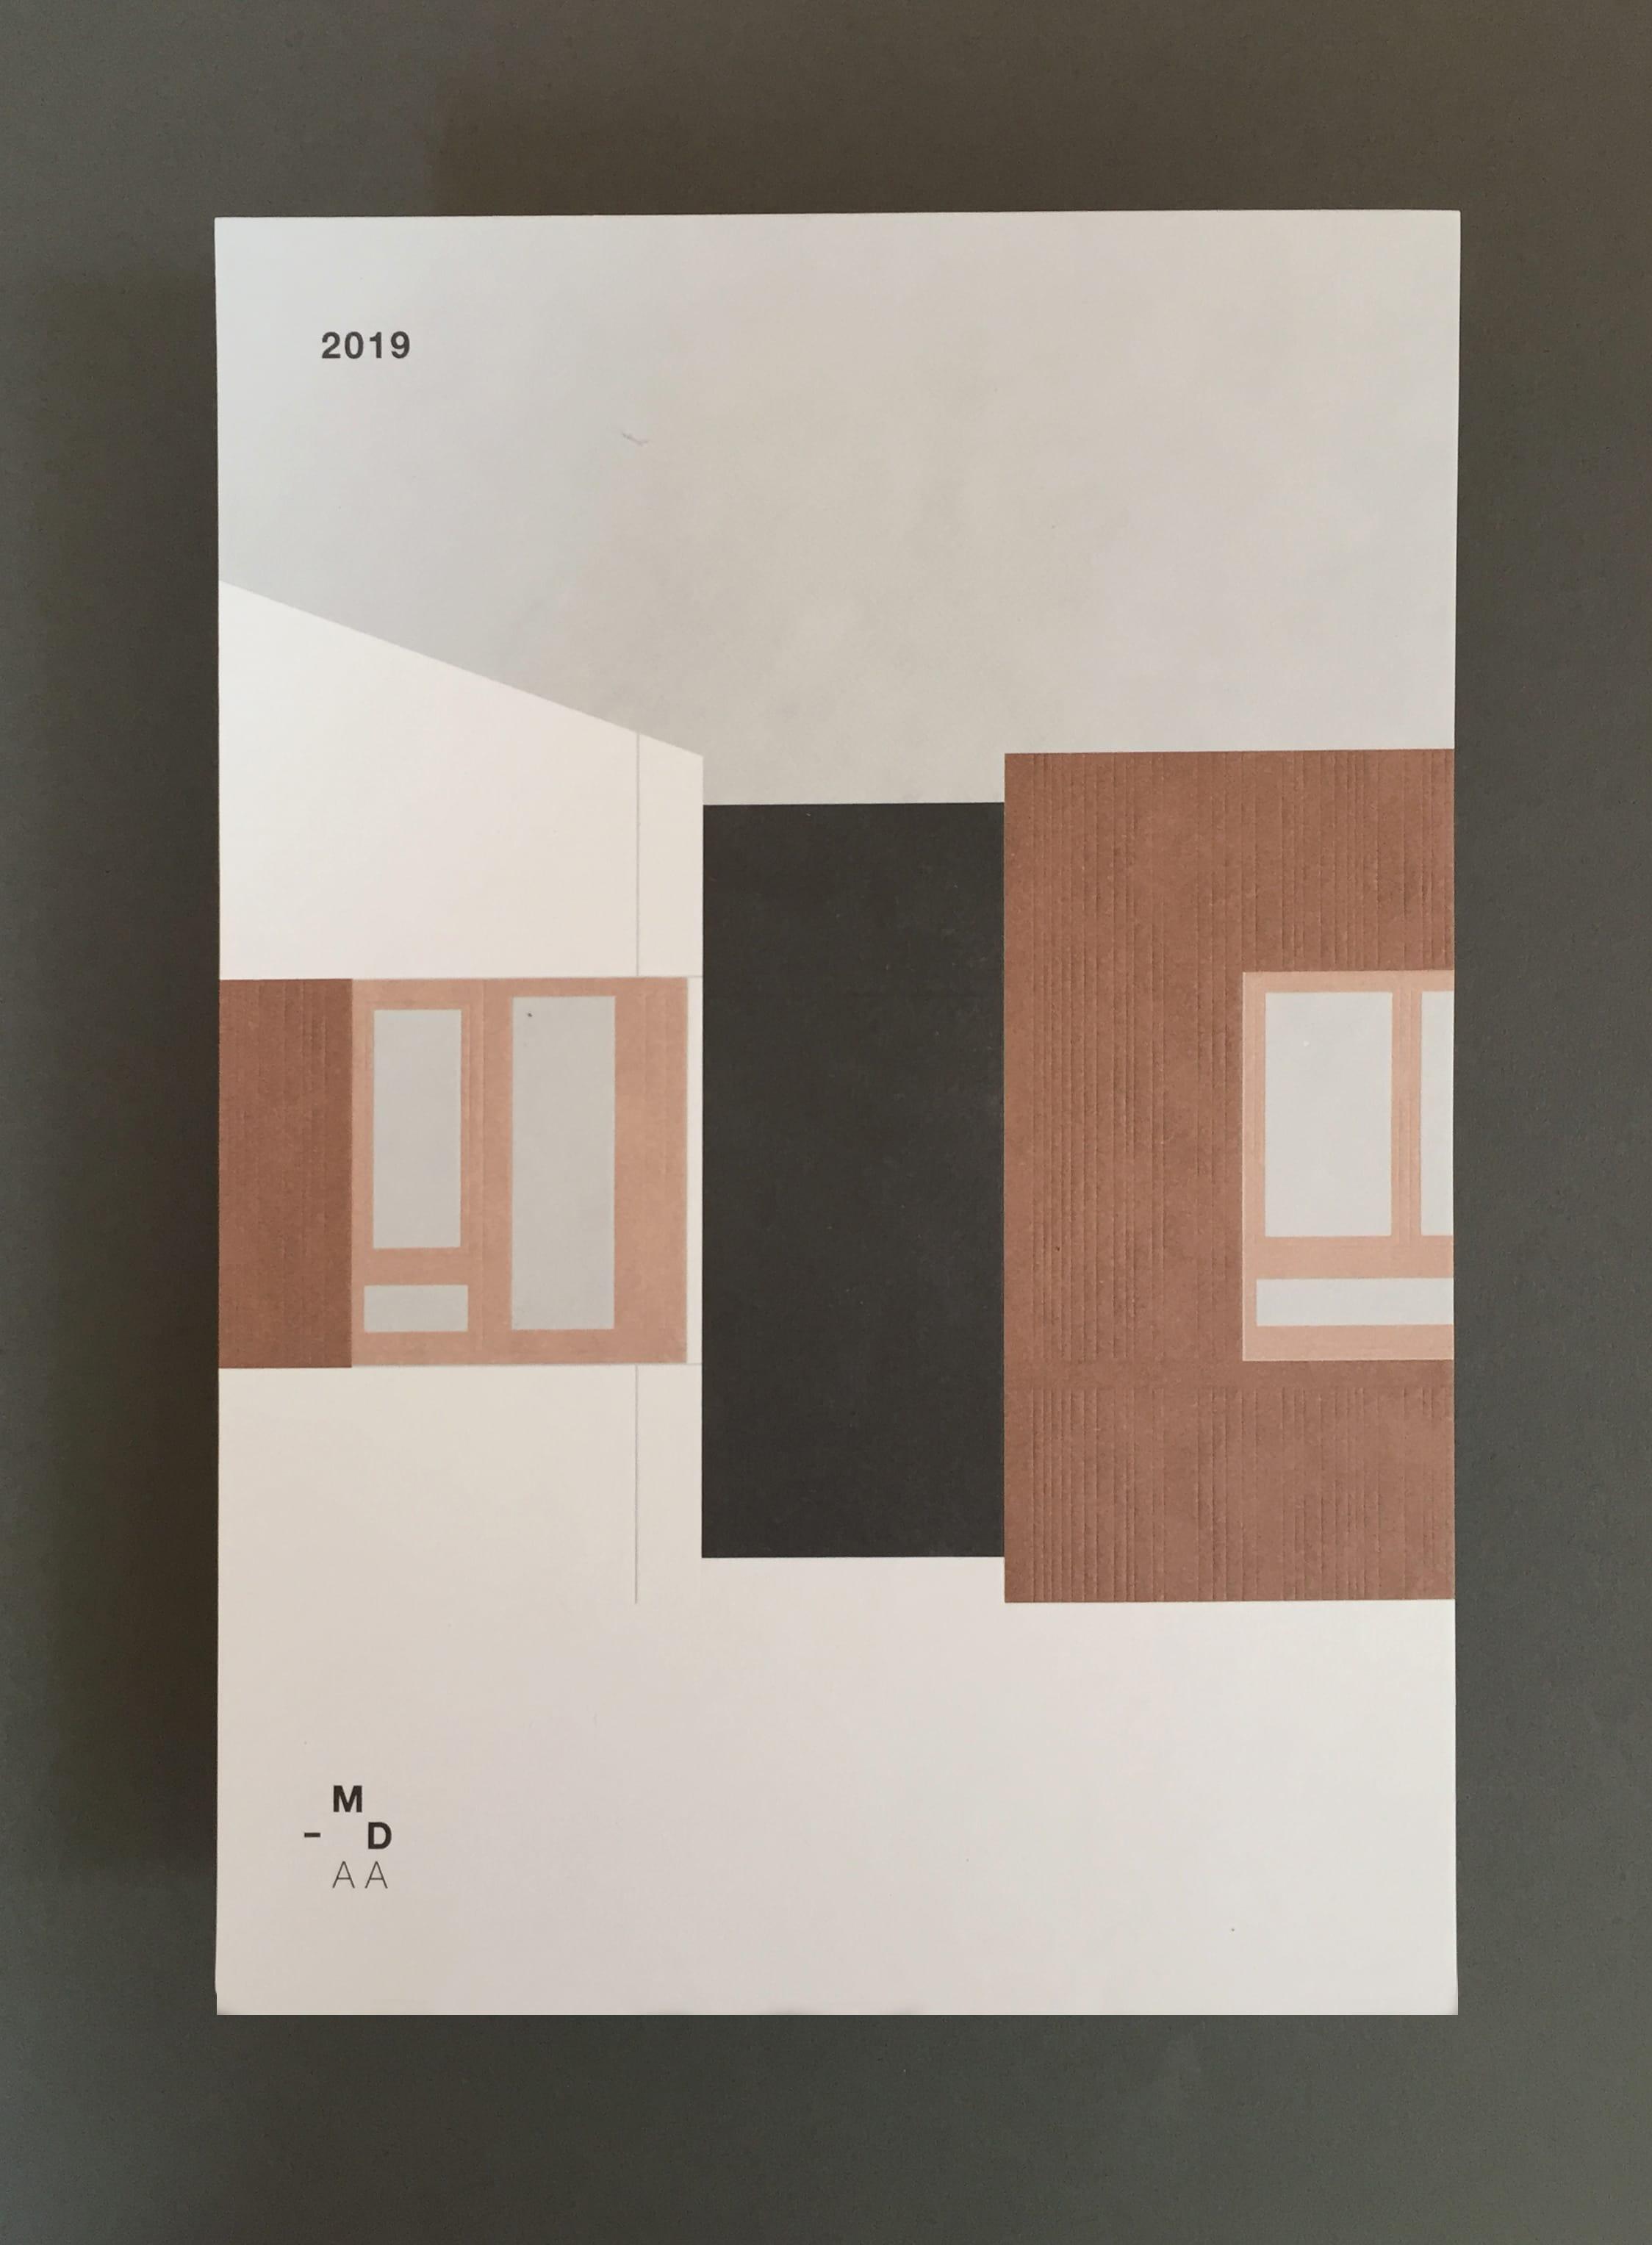 Margot-Duclot architectes